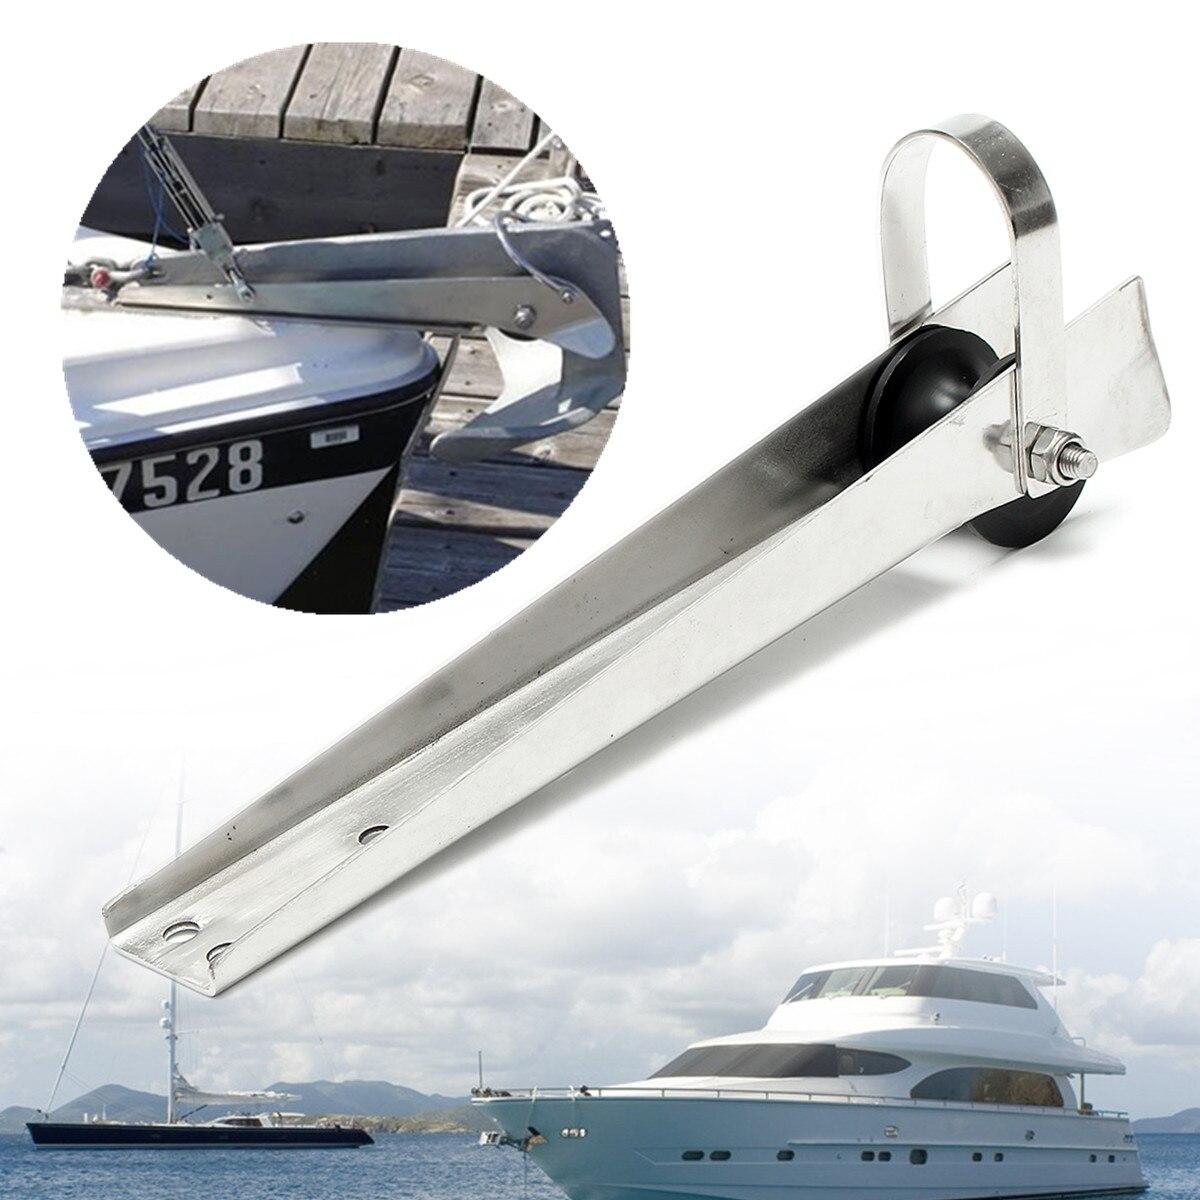 388mm ancla de servicio pesado de acero inoxidable ancla de barco de rodillos de proa para Marina anclas de barco